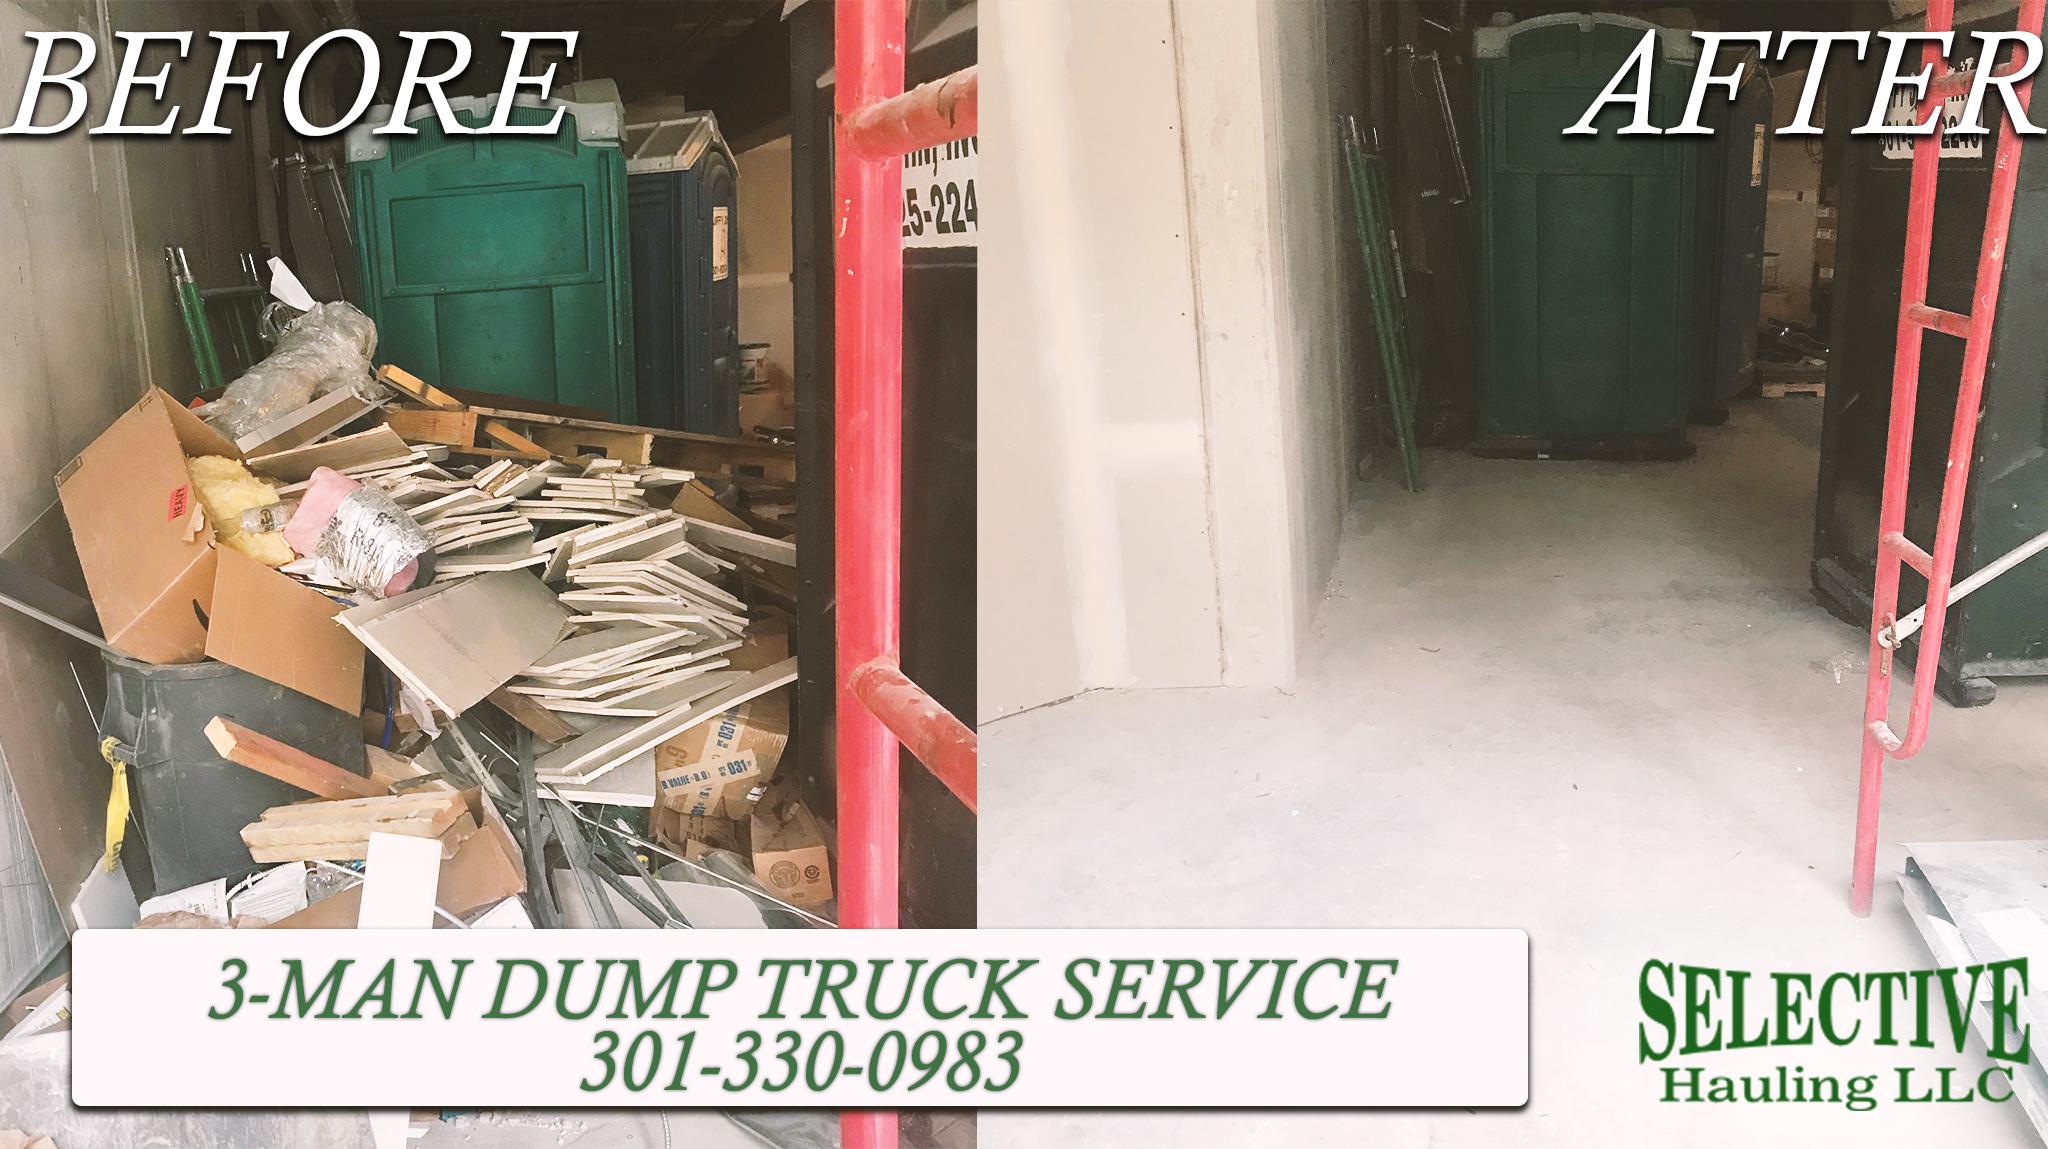 Baltimore junk removal service